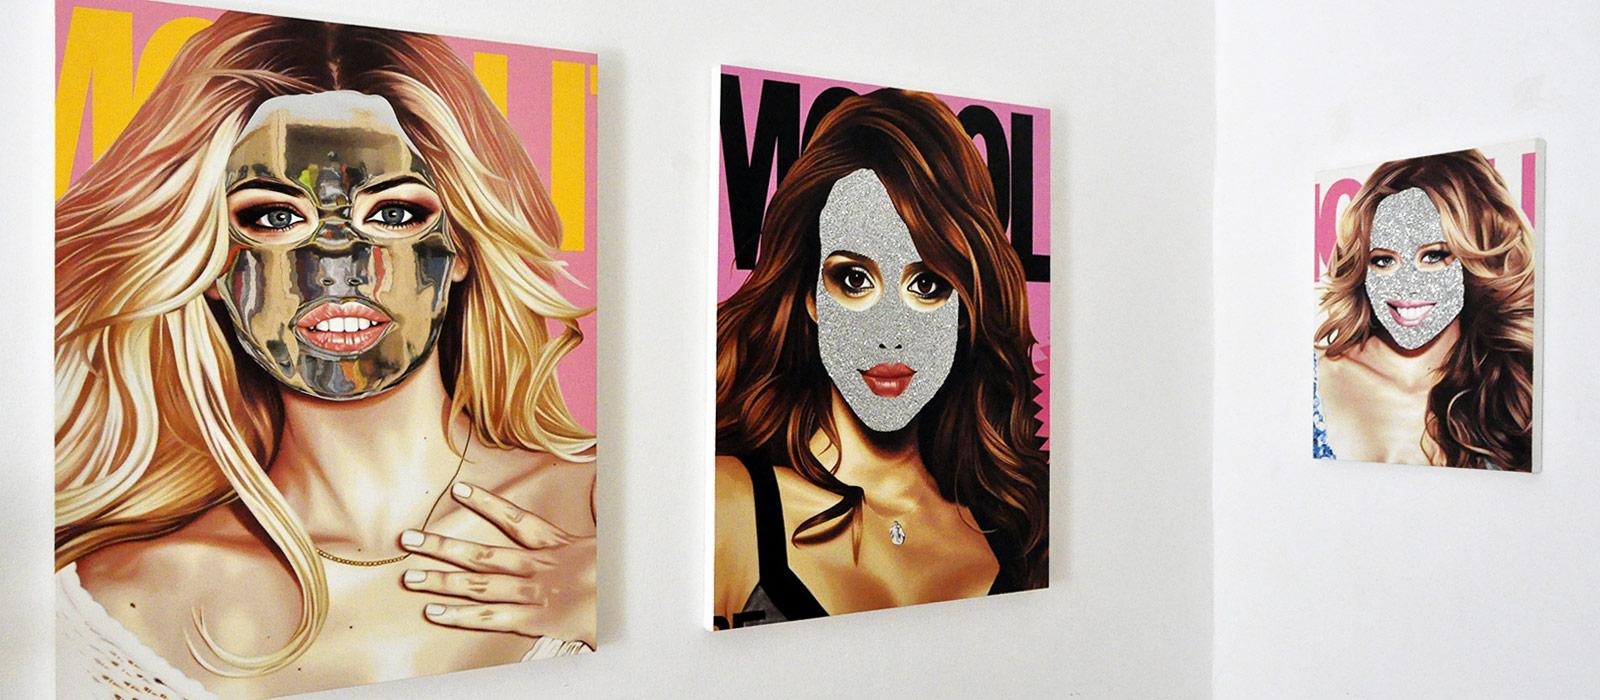 galleria arte contemporanea trieste   Atelier Home Gallery